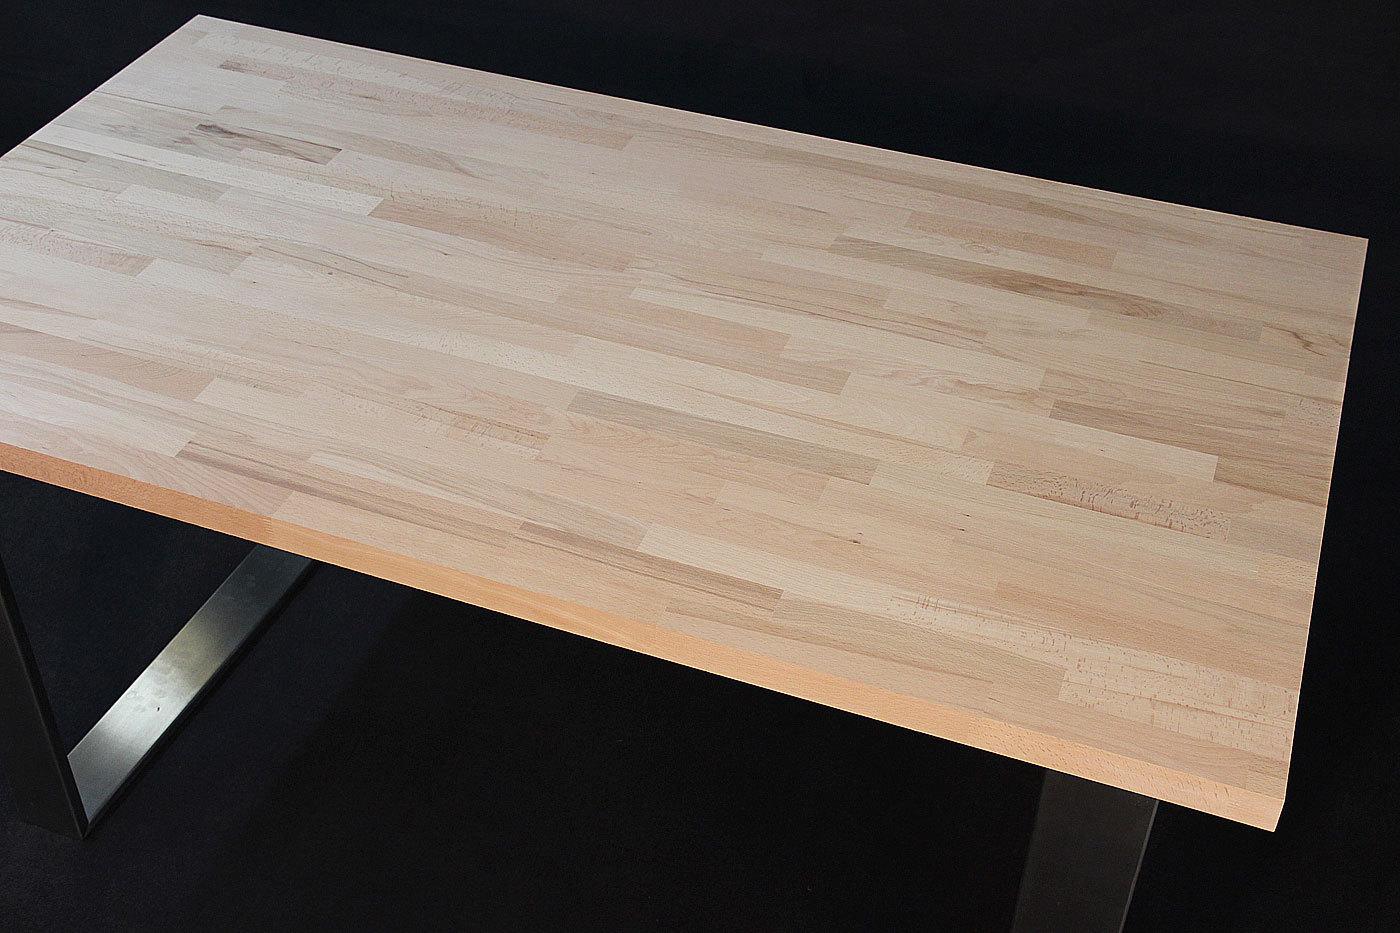 Tischplatte massivholz kernbuche kgz fsc 40 x diverse for Massivholz tischplatte